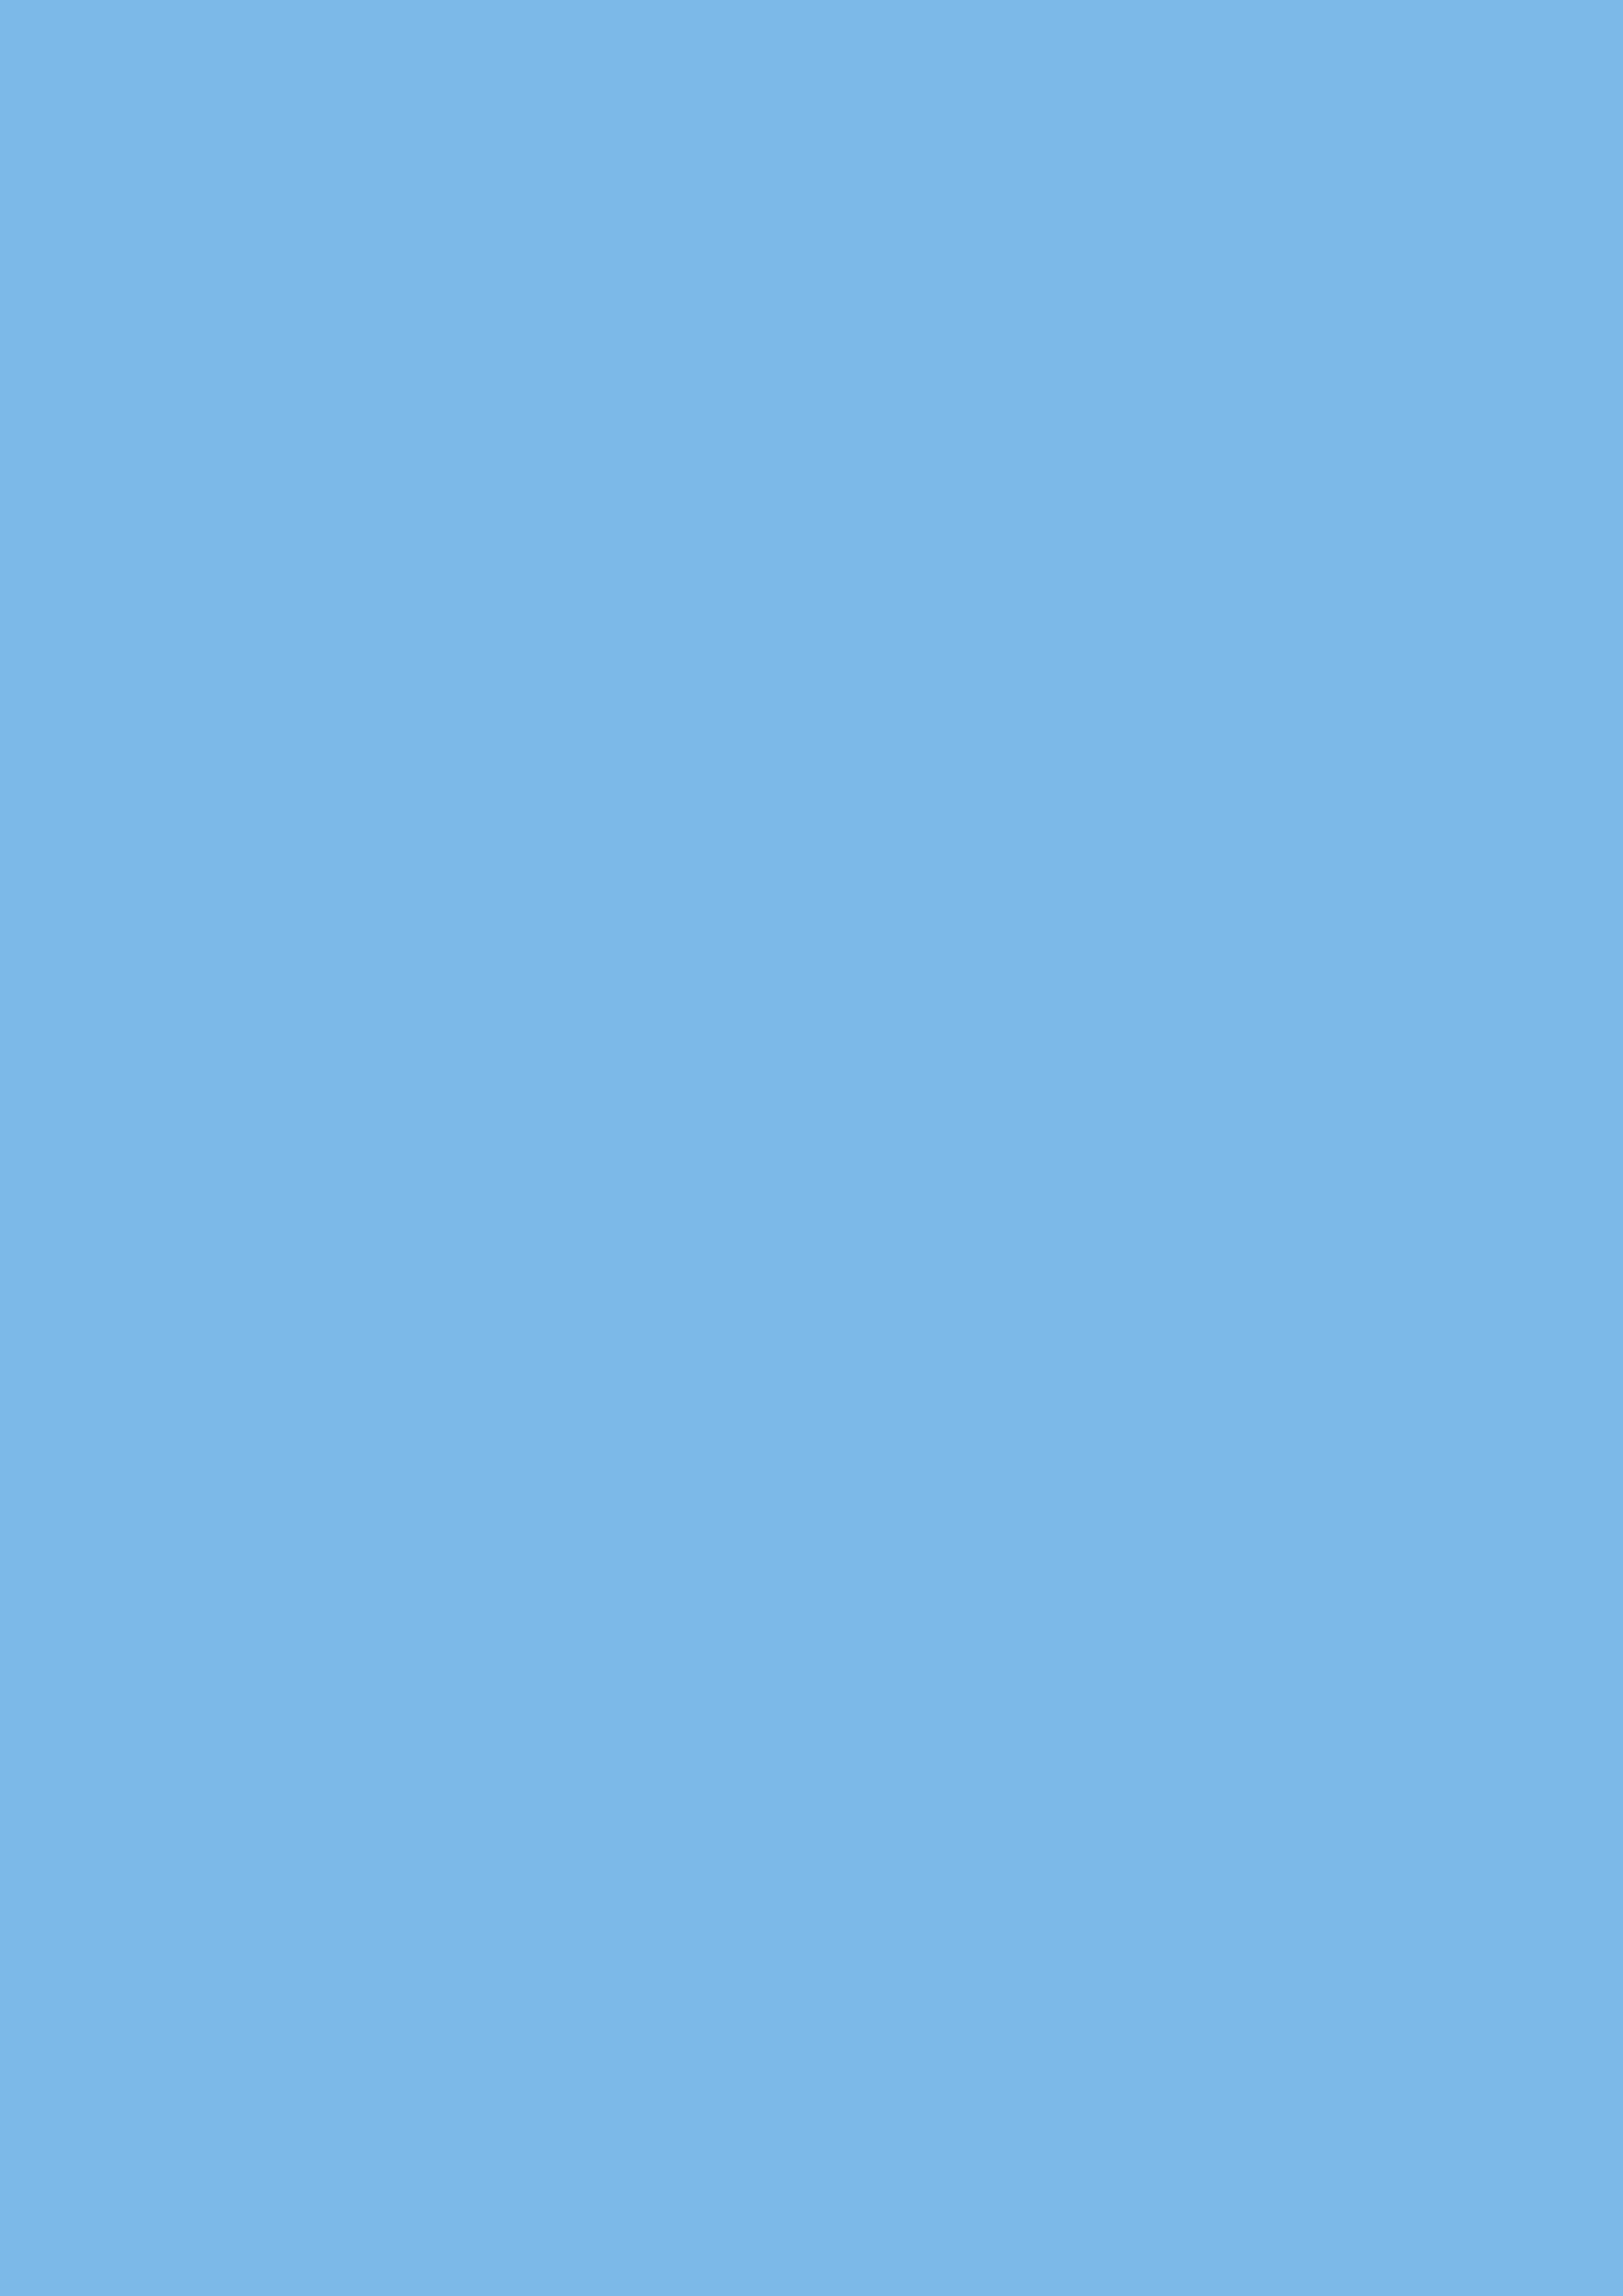 2480x3508 Aero Solid Color Background